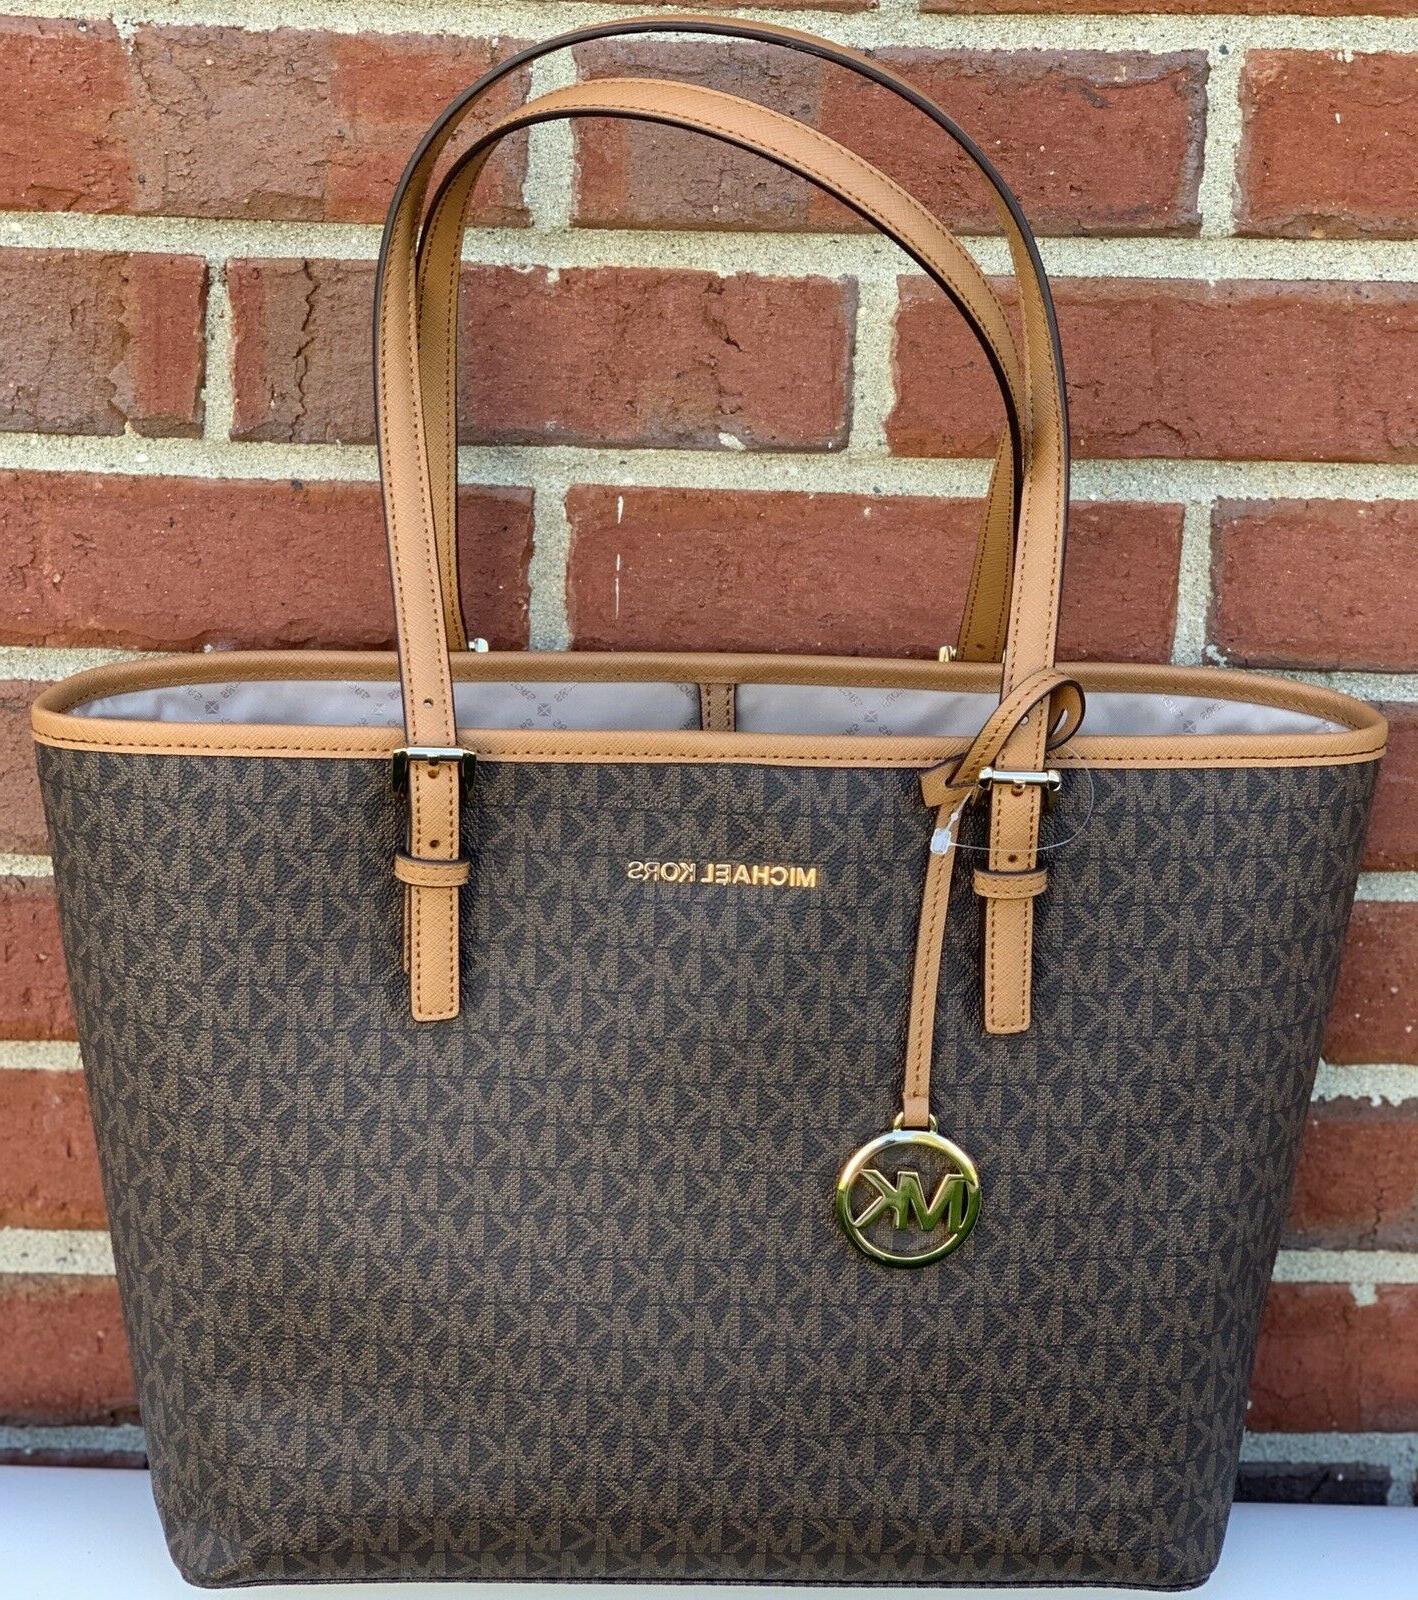 New Kors Set Travel Tote Bag Brown